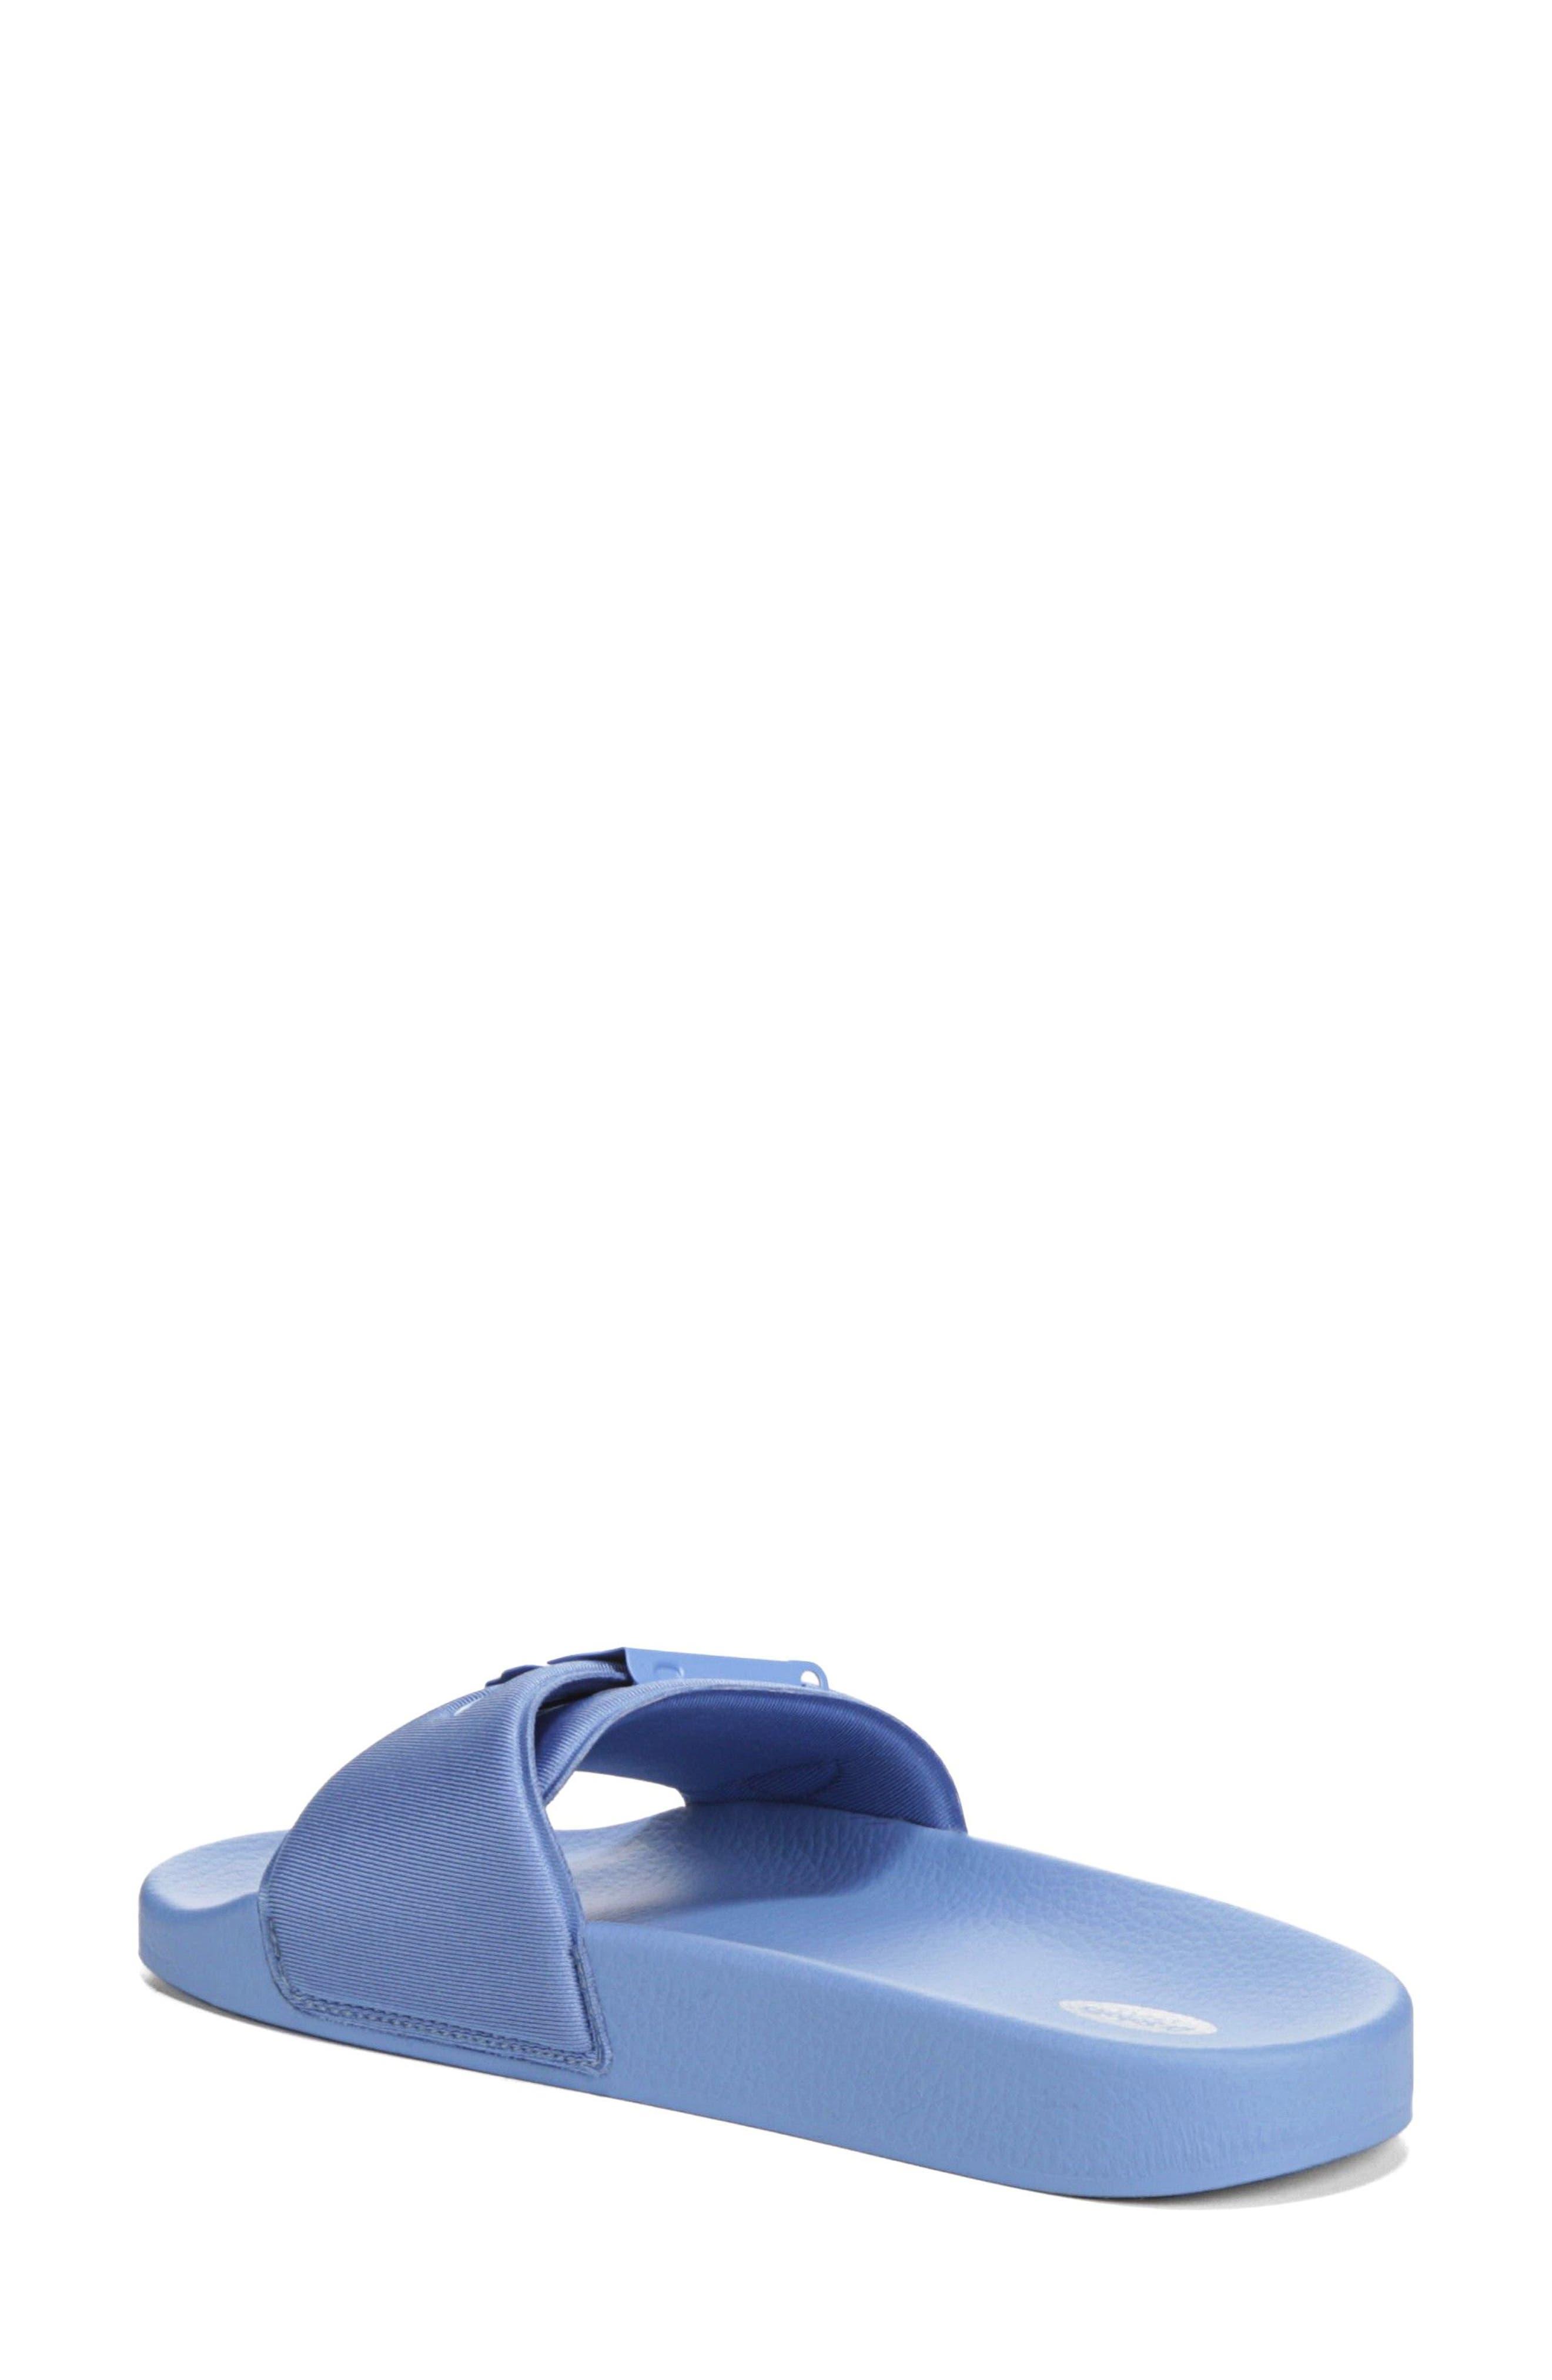 Original Pool Slide Sandal,                             Alternate thumbnail 2, color,                             BLUE